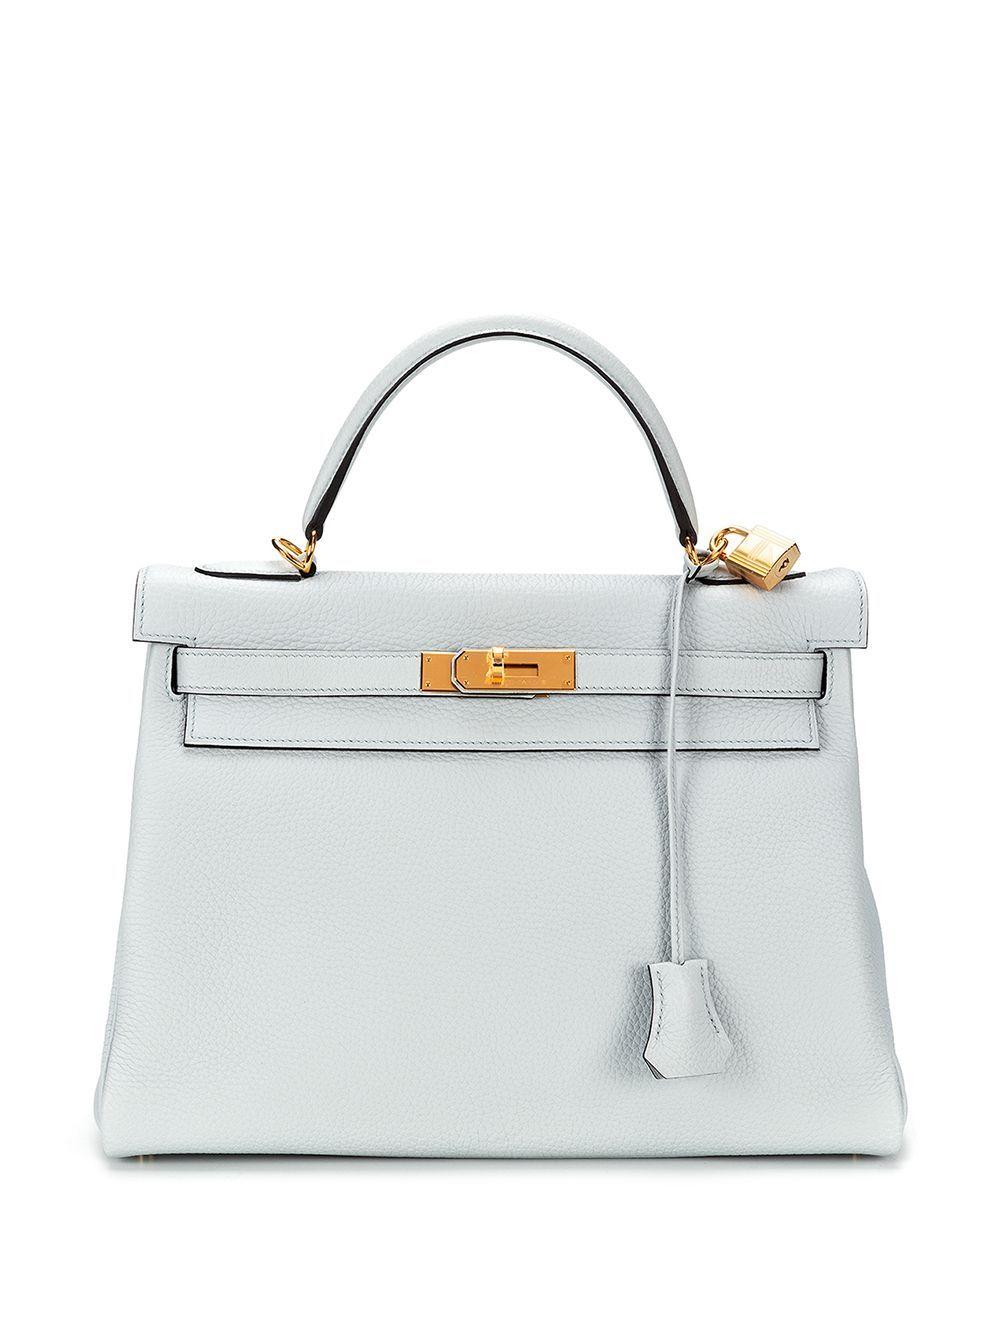 Hermes kelly 32 leather handbag